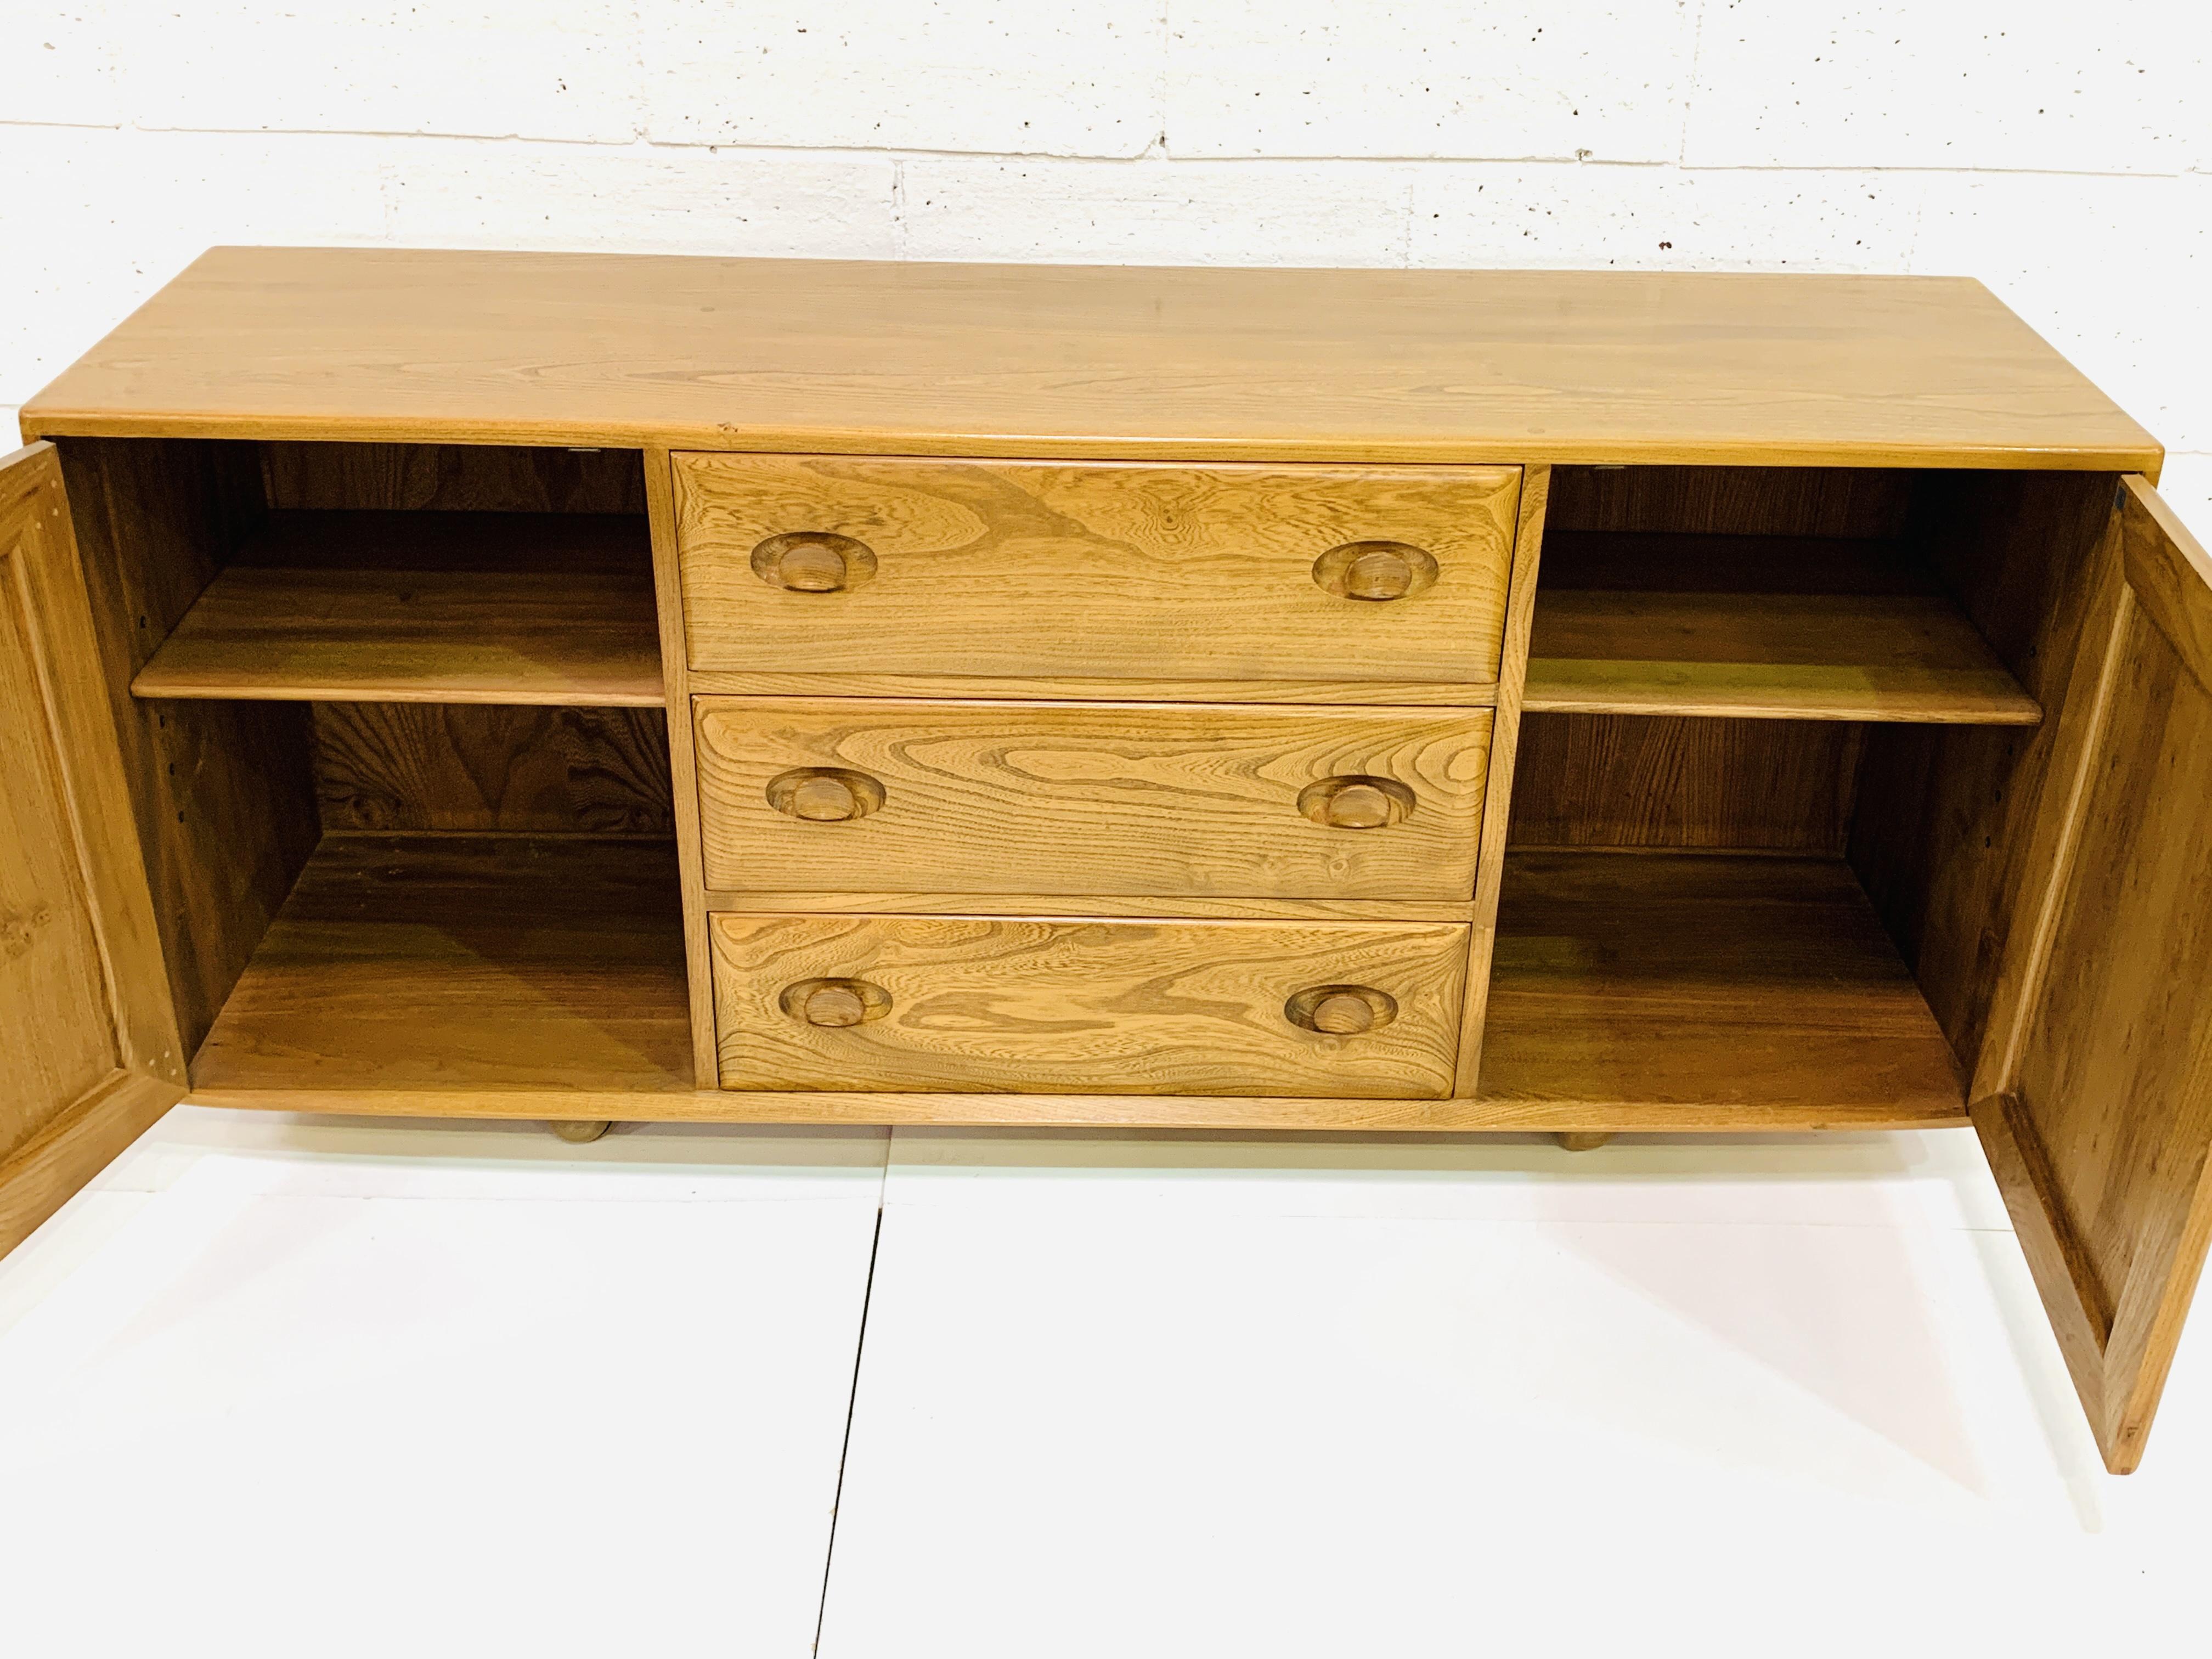 Ercol sideboard - Image 5 of 6